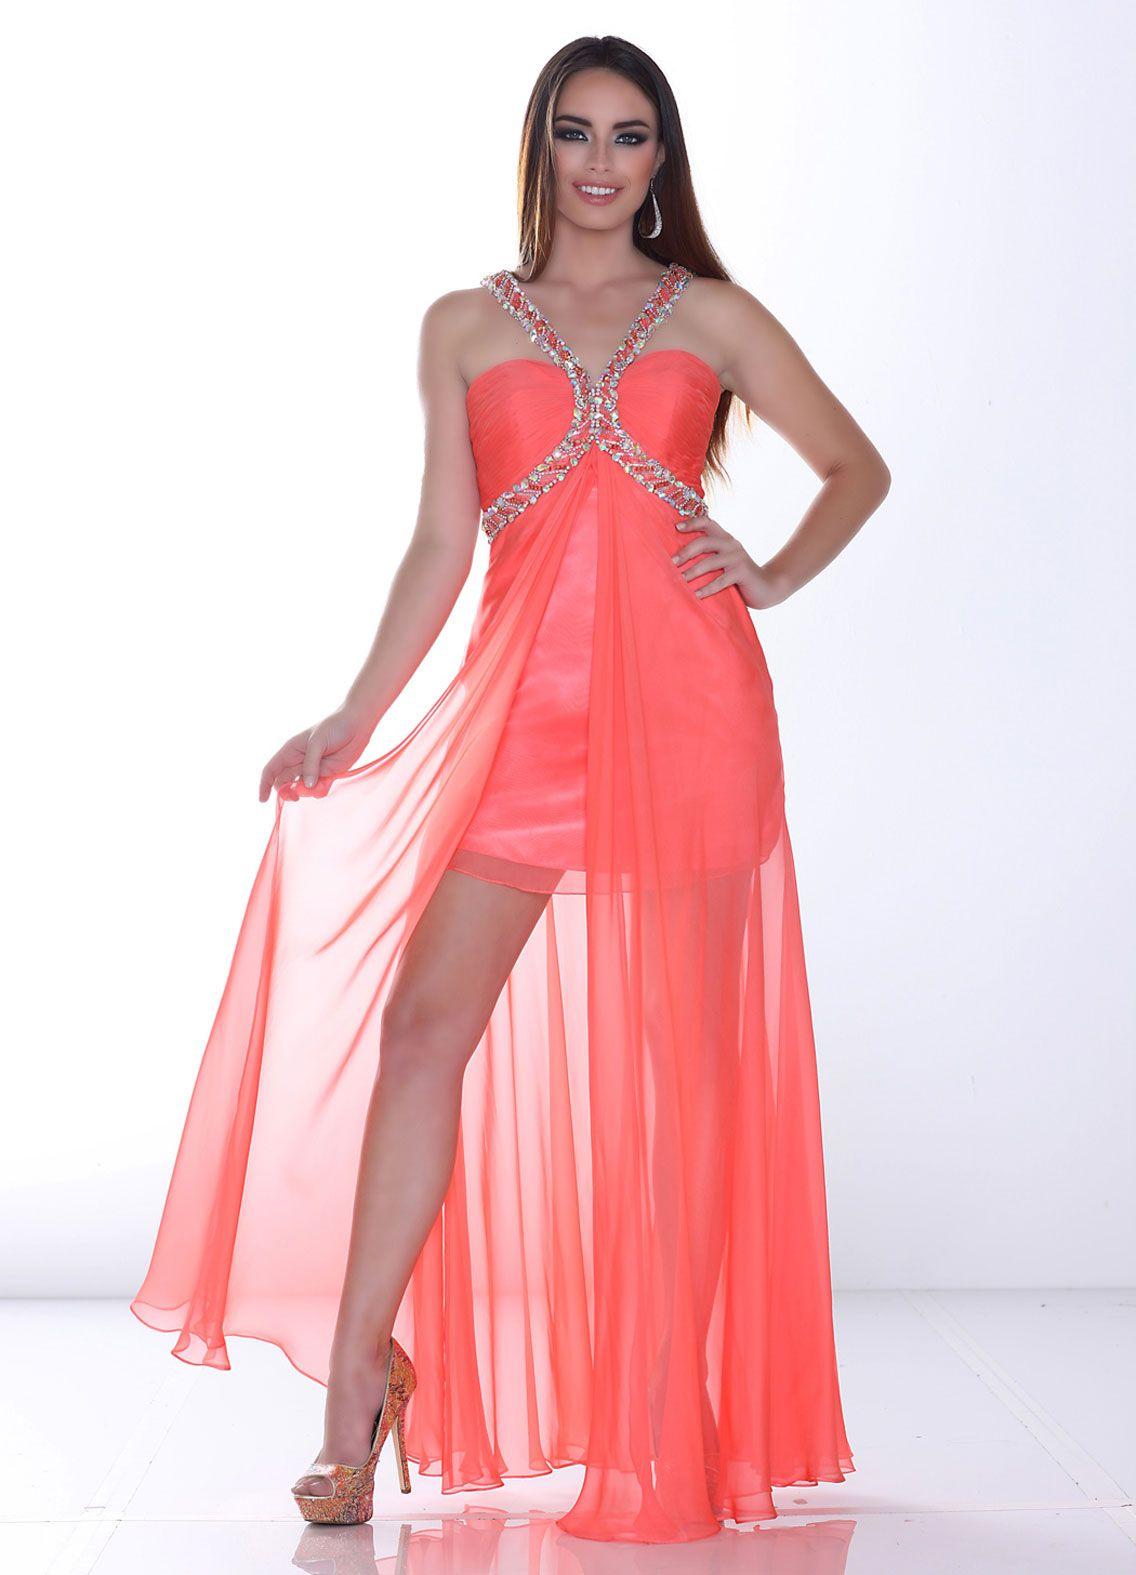 Prom Dress by Xtreme Prom | dresses | Pinterest